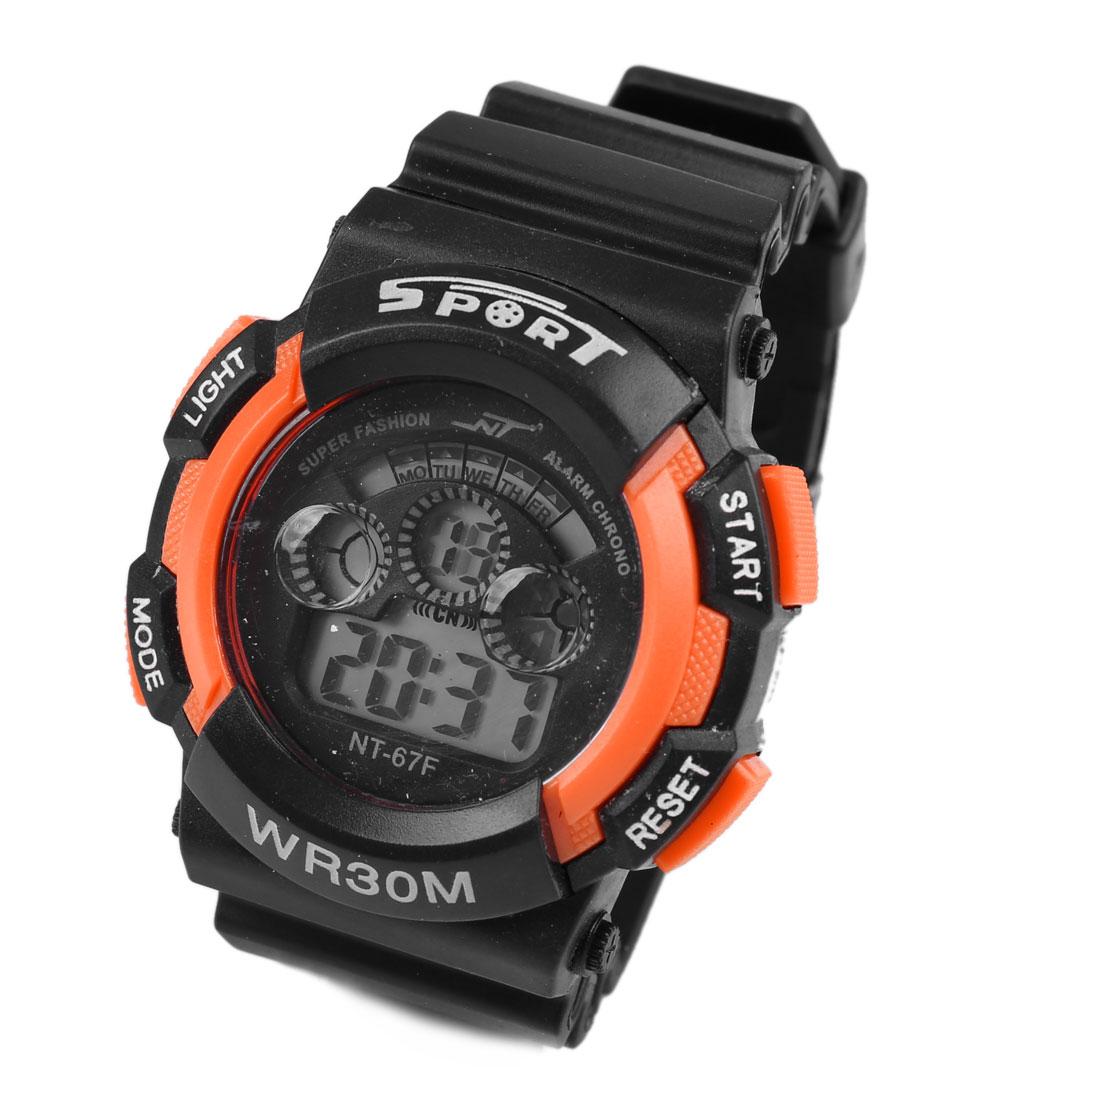 Adjustable Wristband Dark Orange Case Second Date Week Display Water Resistant Sports Watch